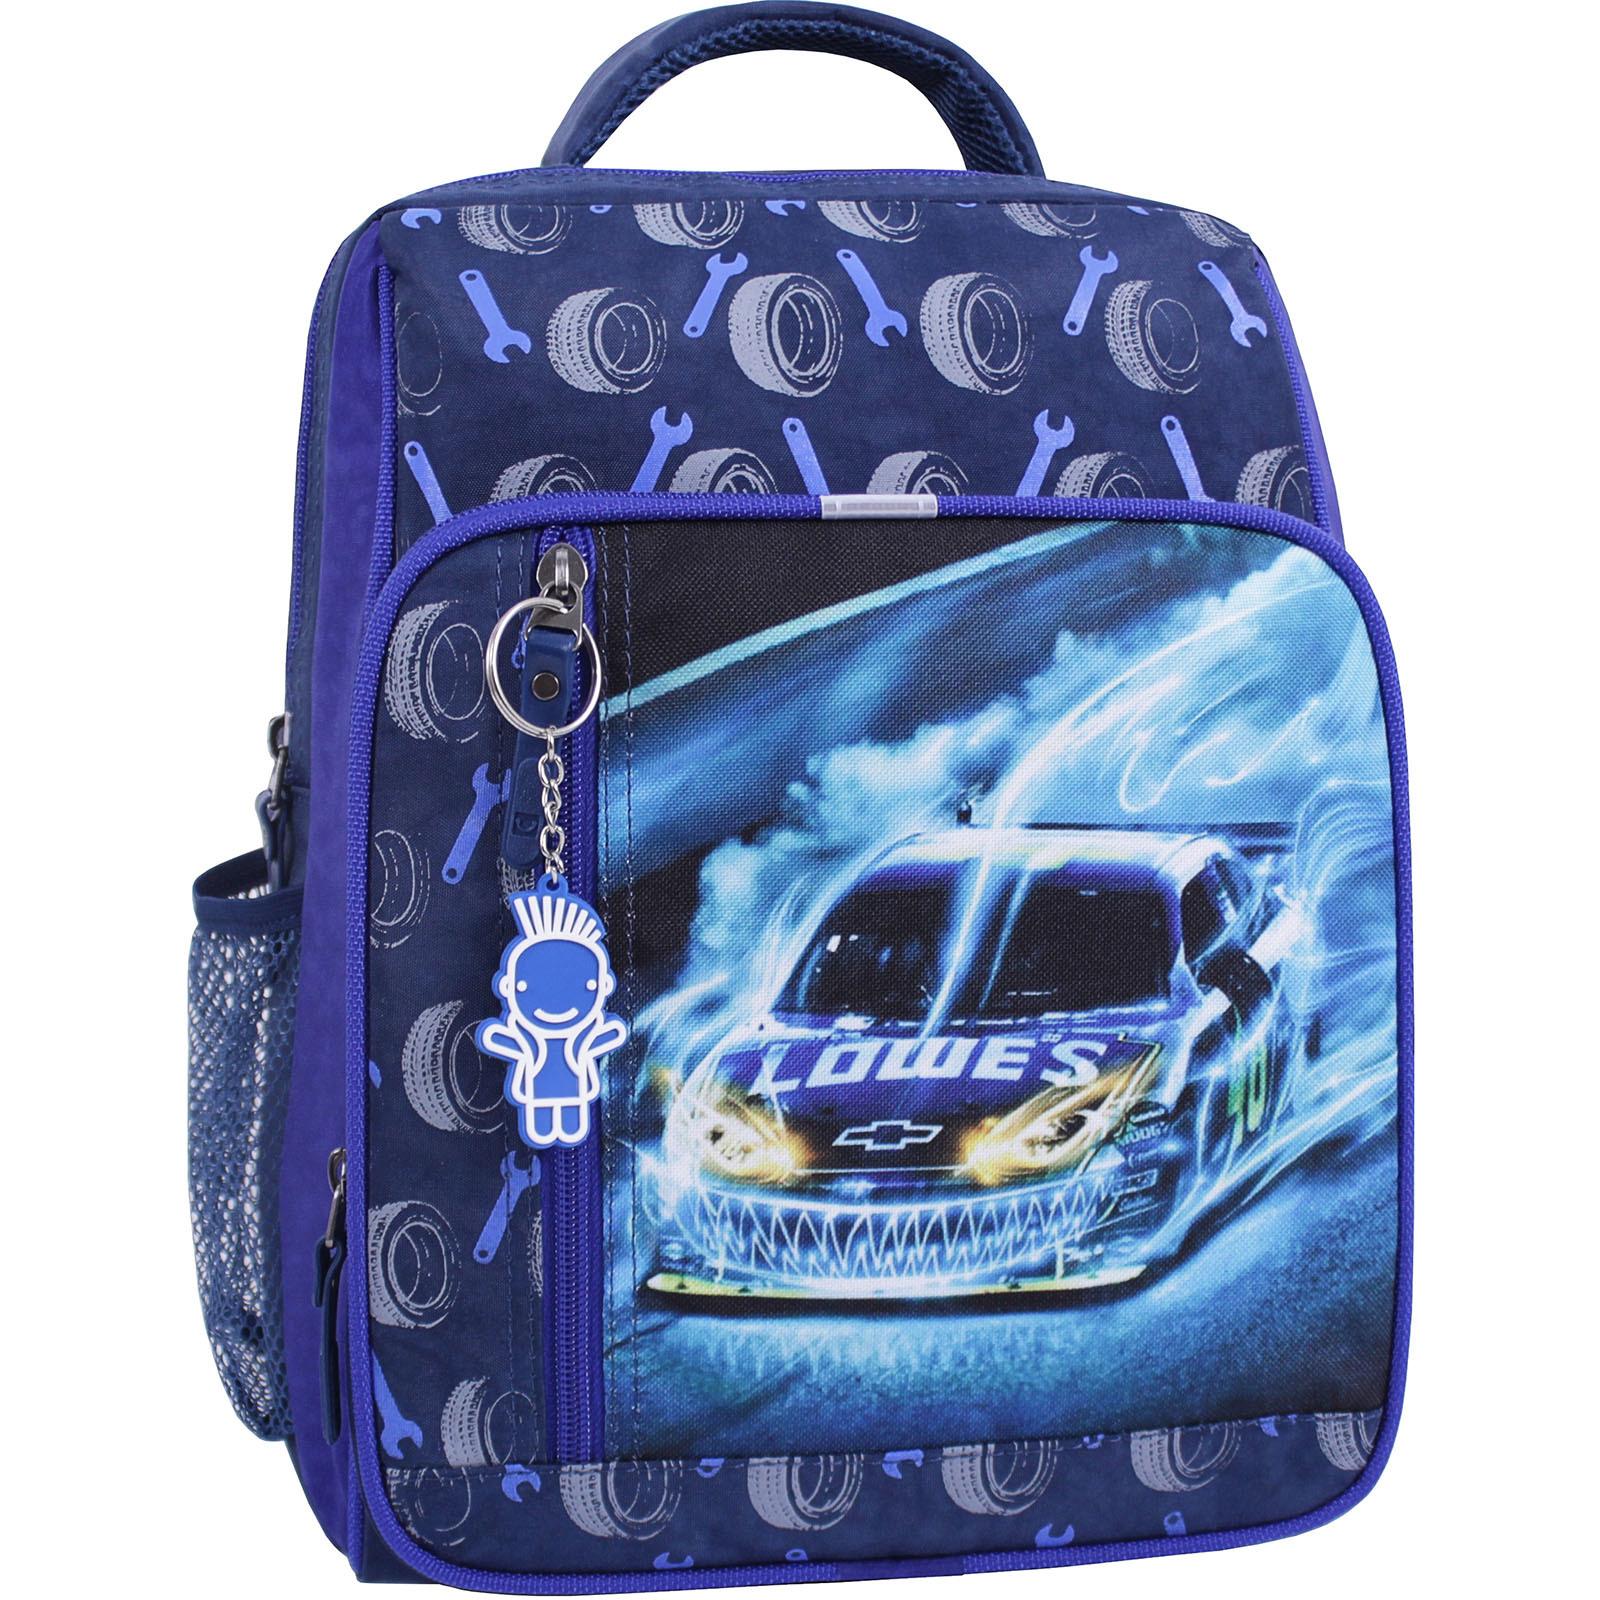 Школьные рюкзаки Рюкзак школьный Bagland Школьник 8 л. 225 синий 555 (00112702) IMG_1686_суб.555_.JPG